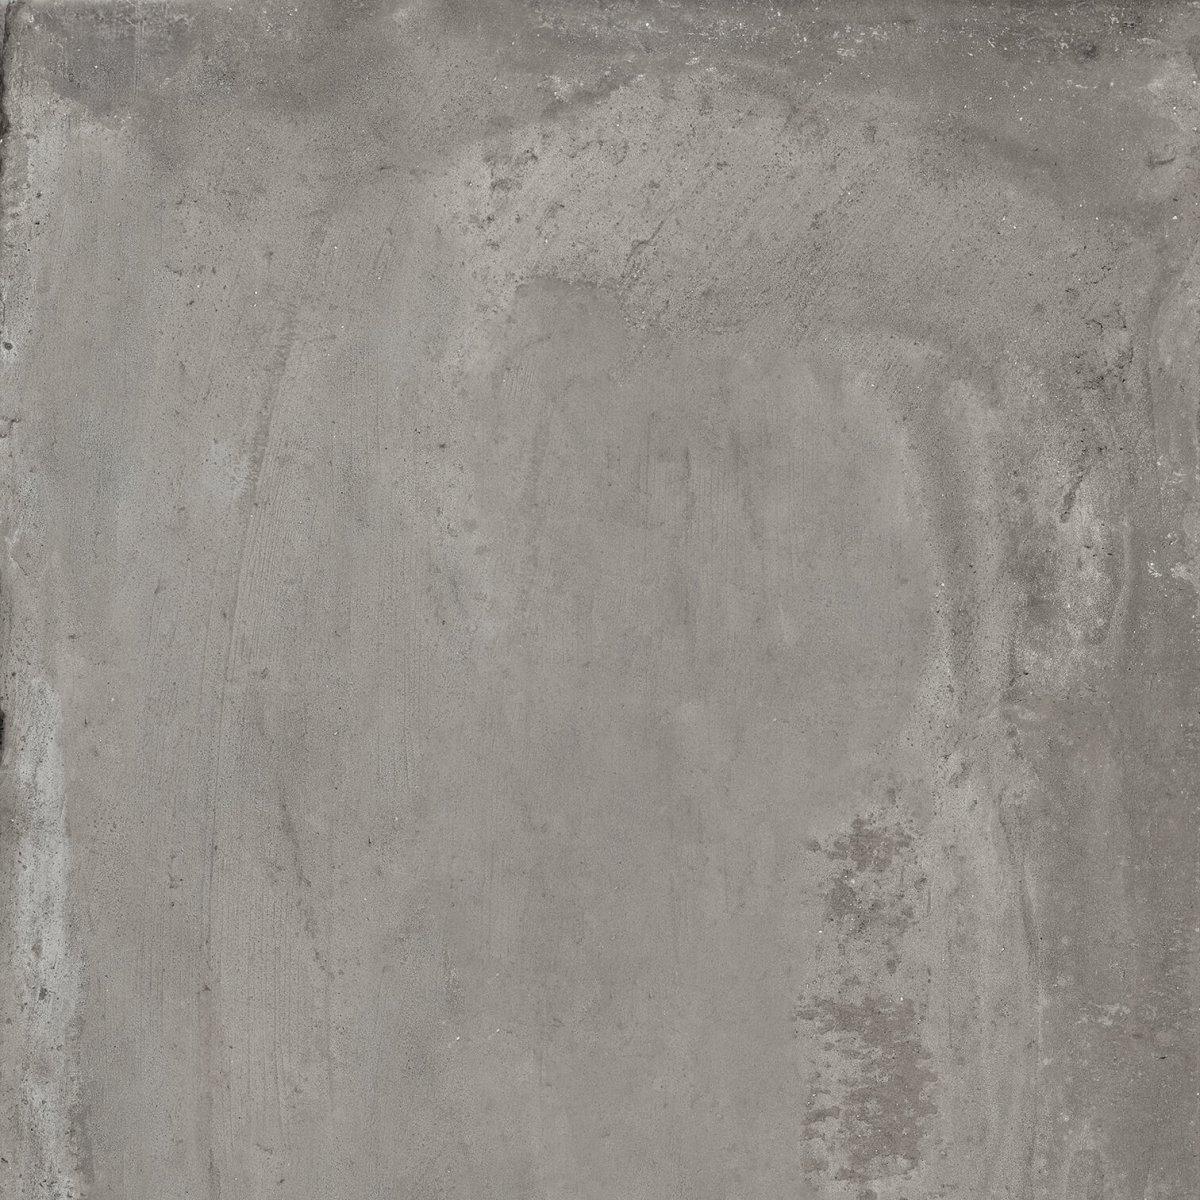 Florim Beton One Ash 600x600mm_Stiles_Product_Image3